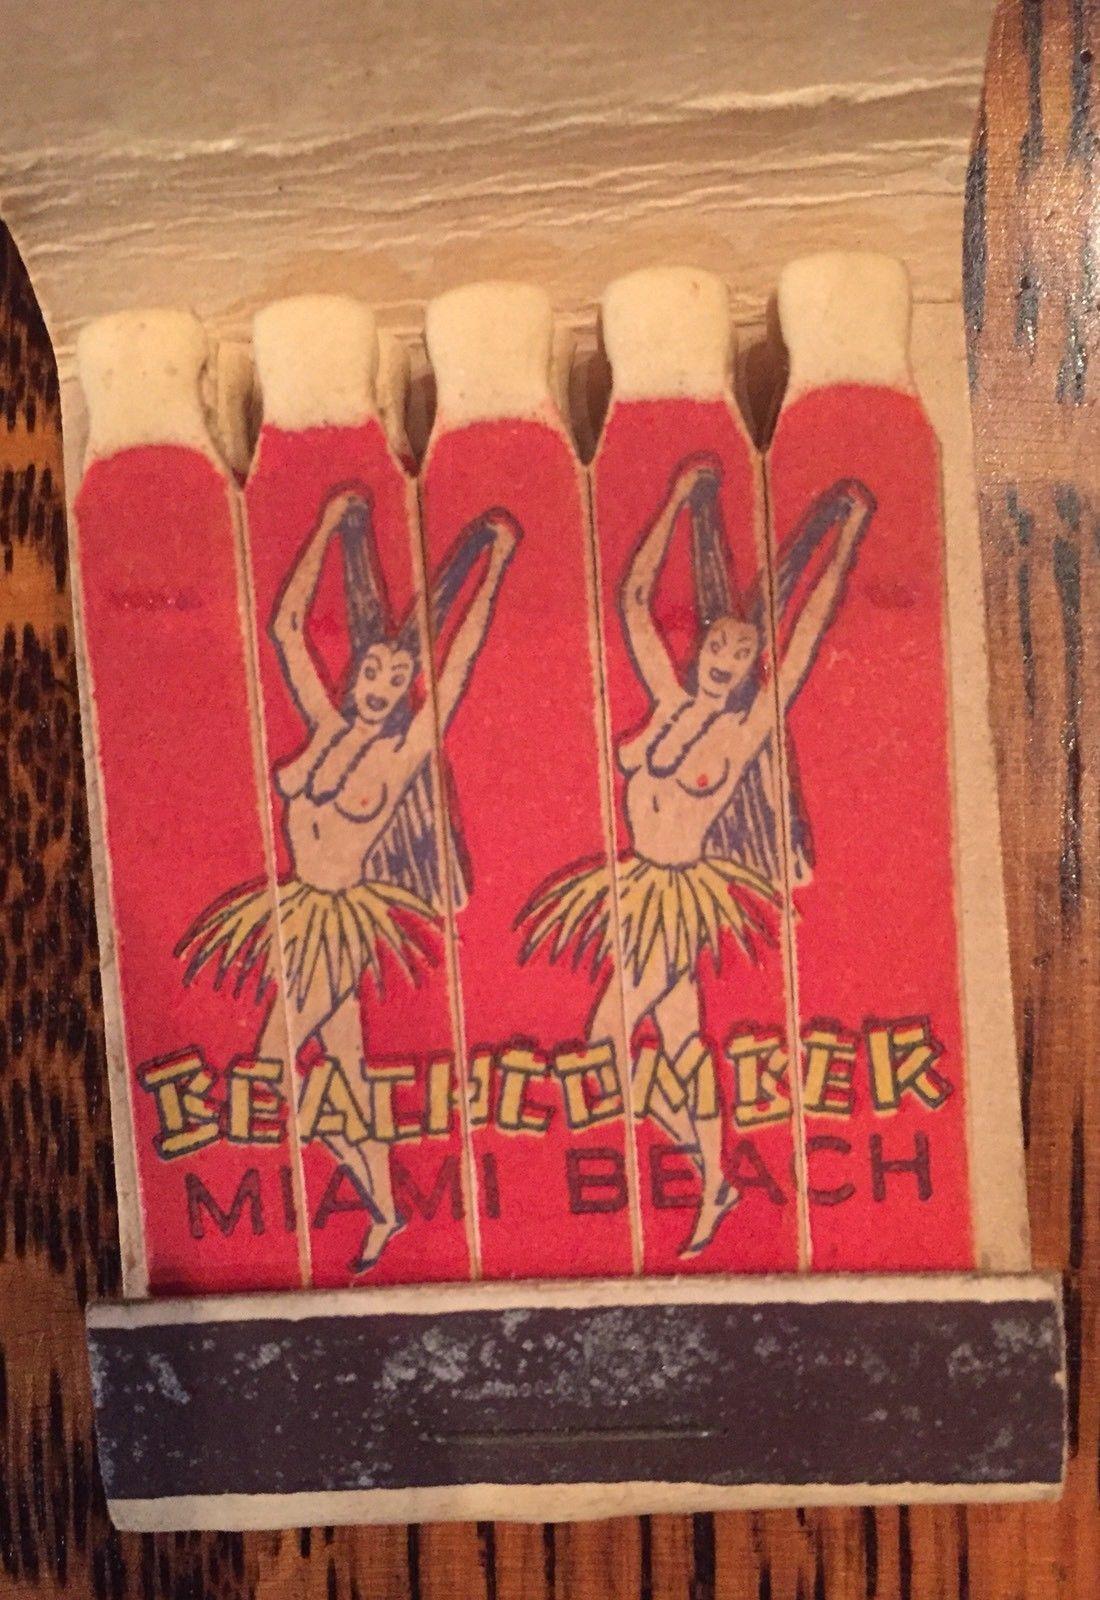 Vintage topless hula